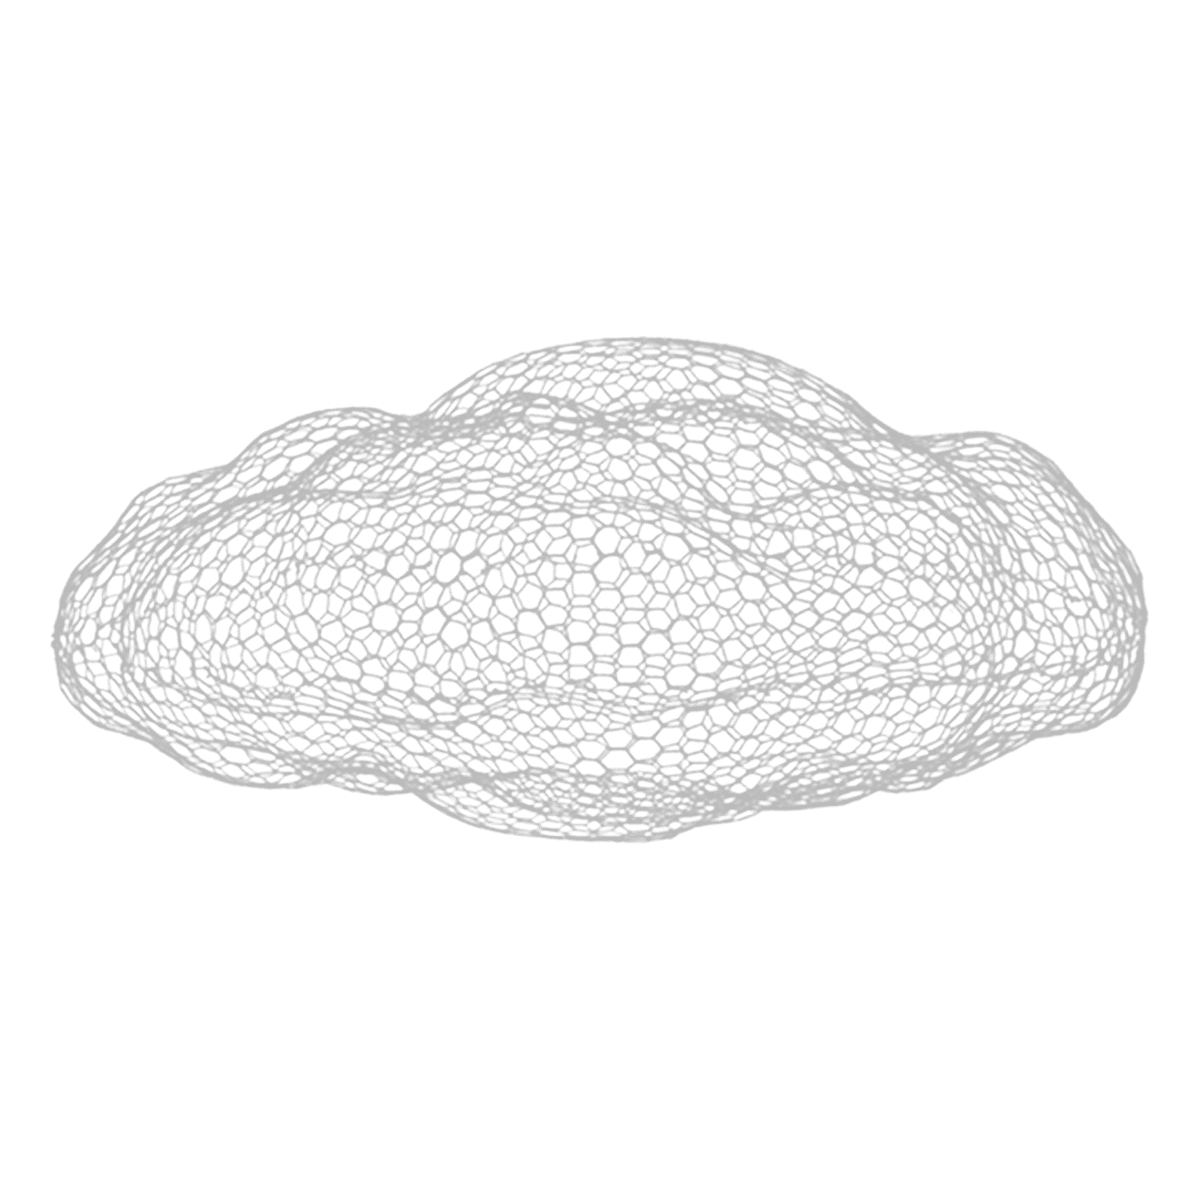 Escultura Suspensa Birds And Clouds Magis® Original &Amp;Bull; Escultura Suspensa Clouds - 1 &Amp;Bull; Deezign